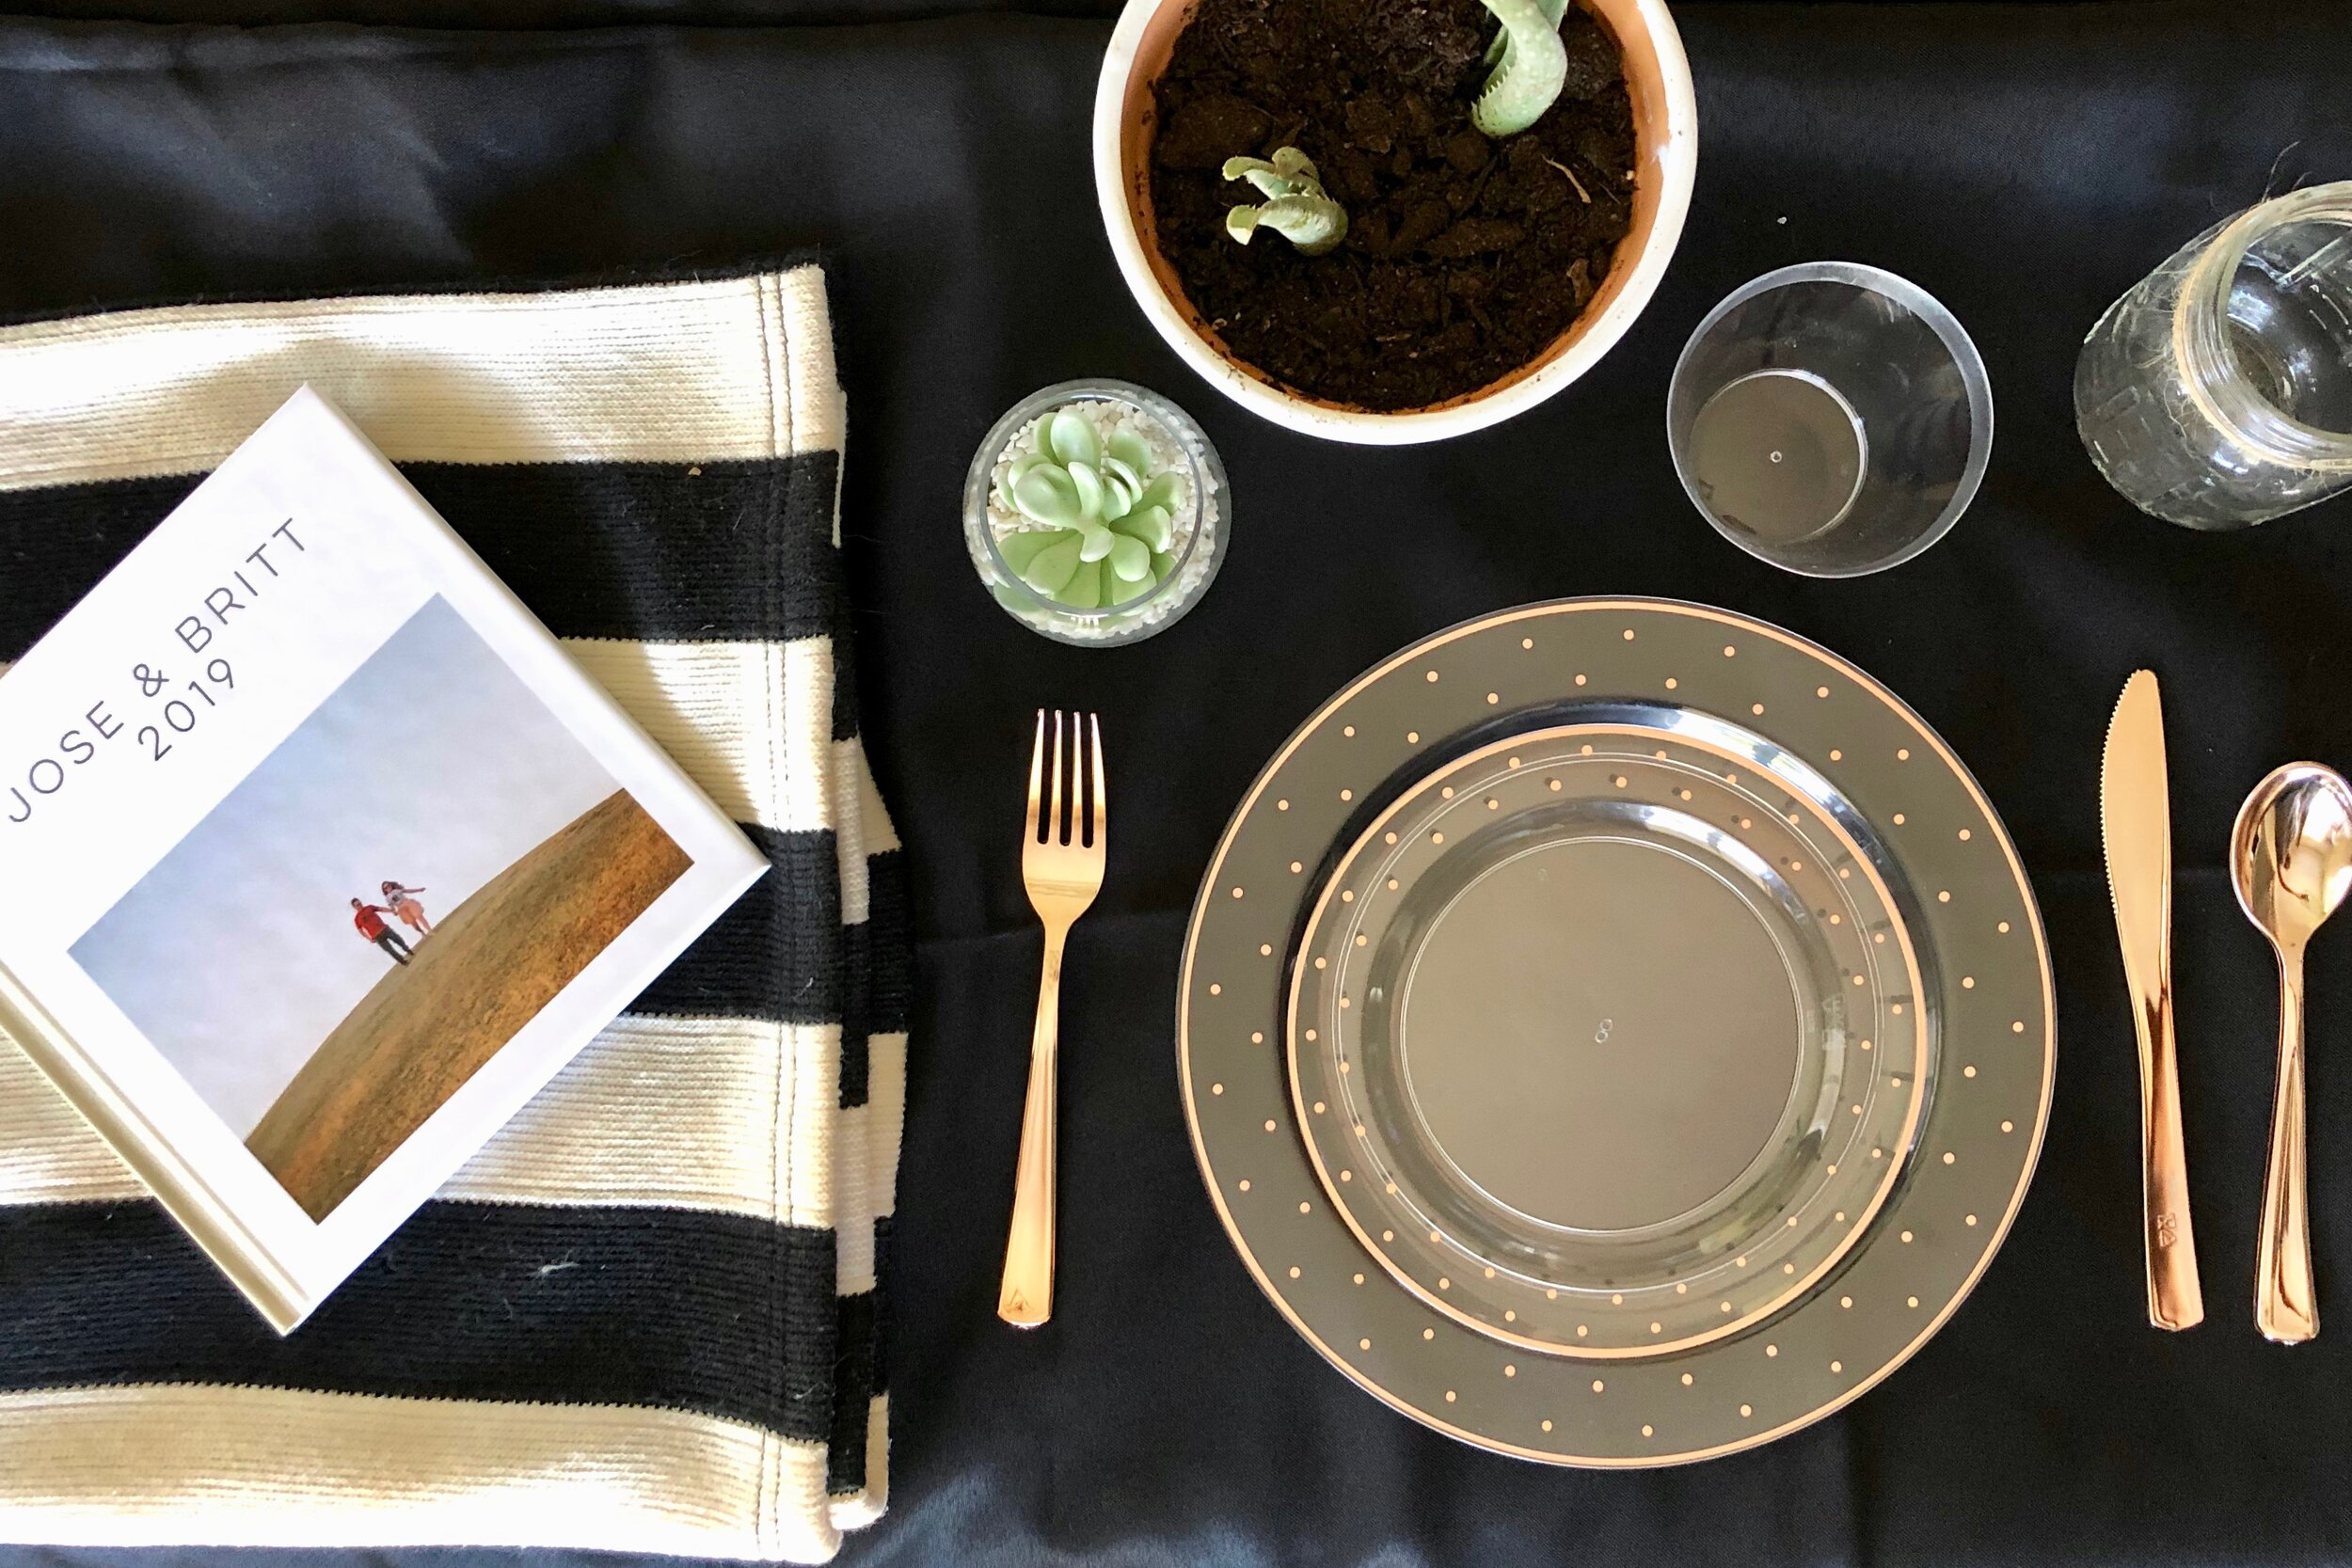 FINDING AZ WEDDING TABLE SETTING